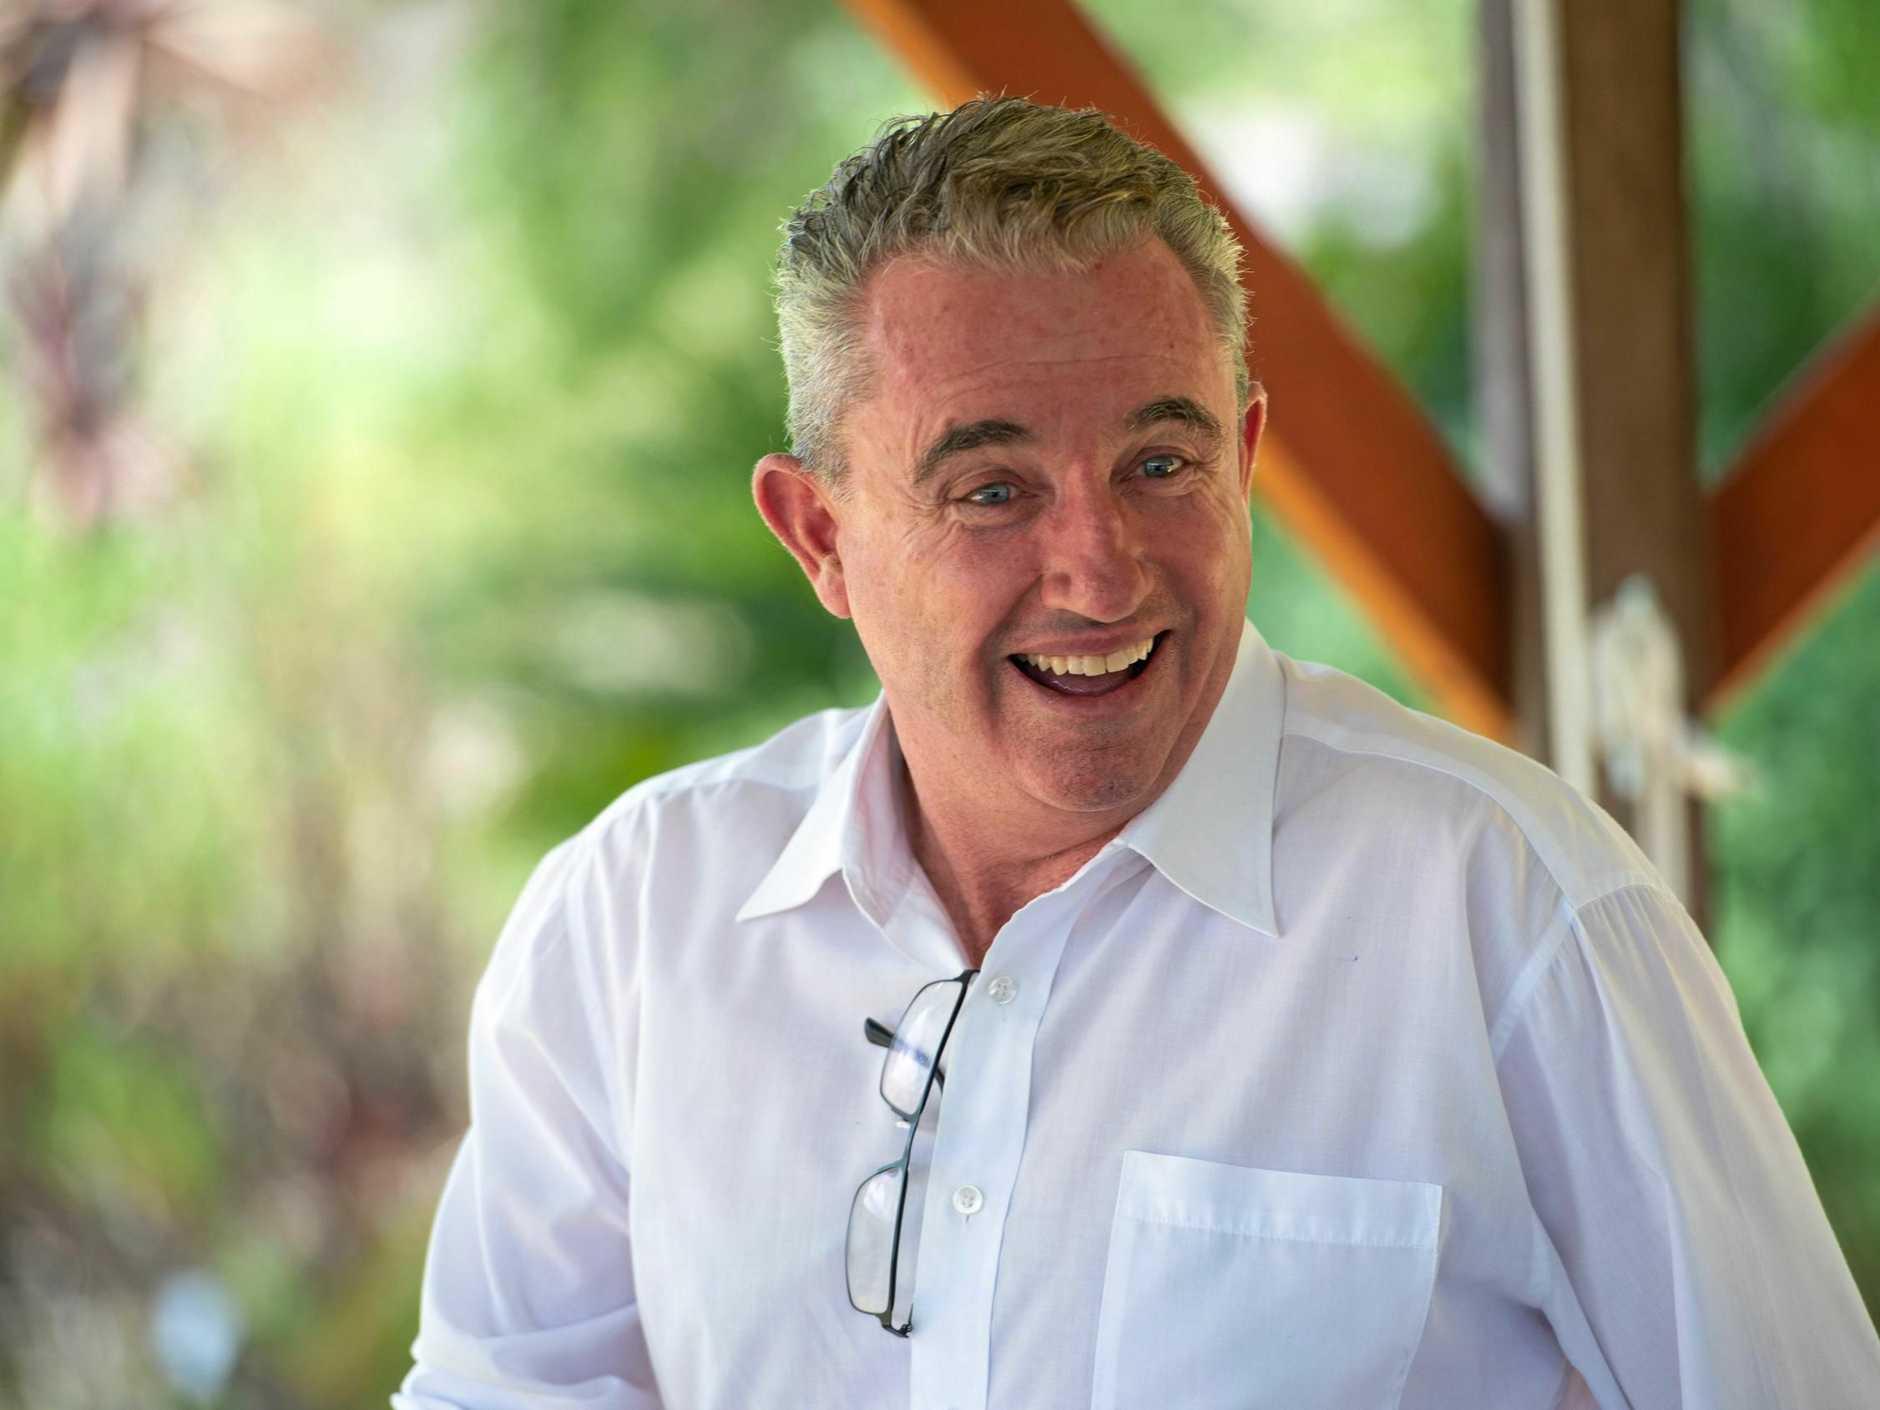 Kevin Hogan federal member for Page, talks with Nana Glenn residents re. solar farm proposal. . 05 FEB 2018